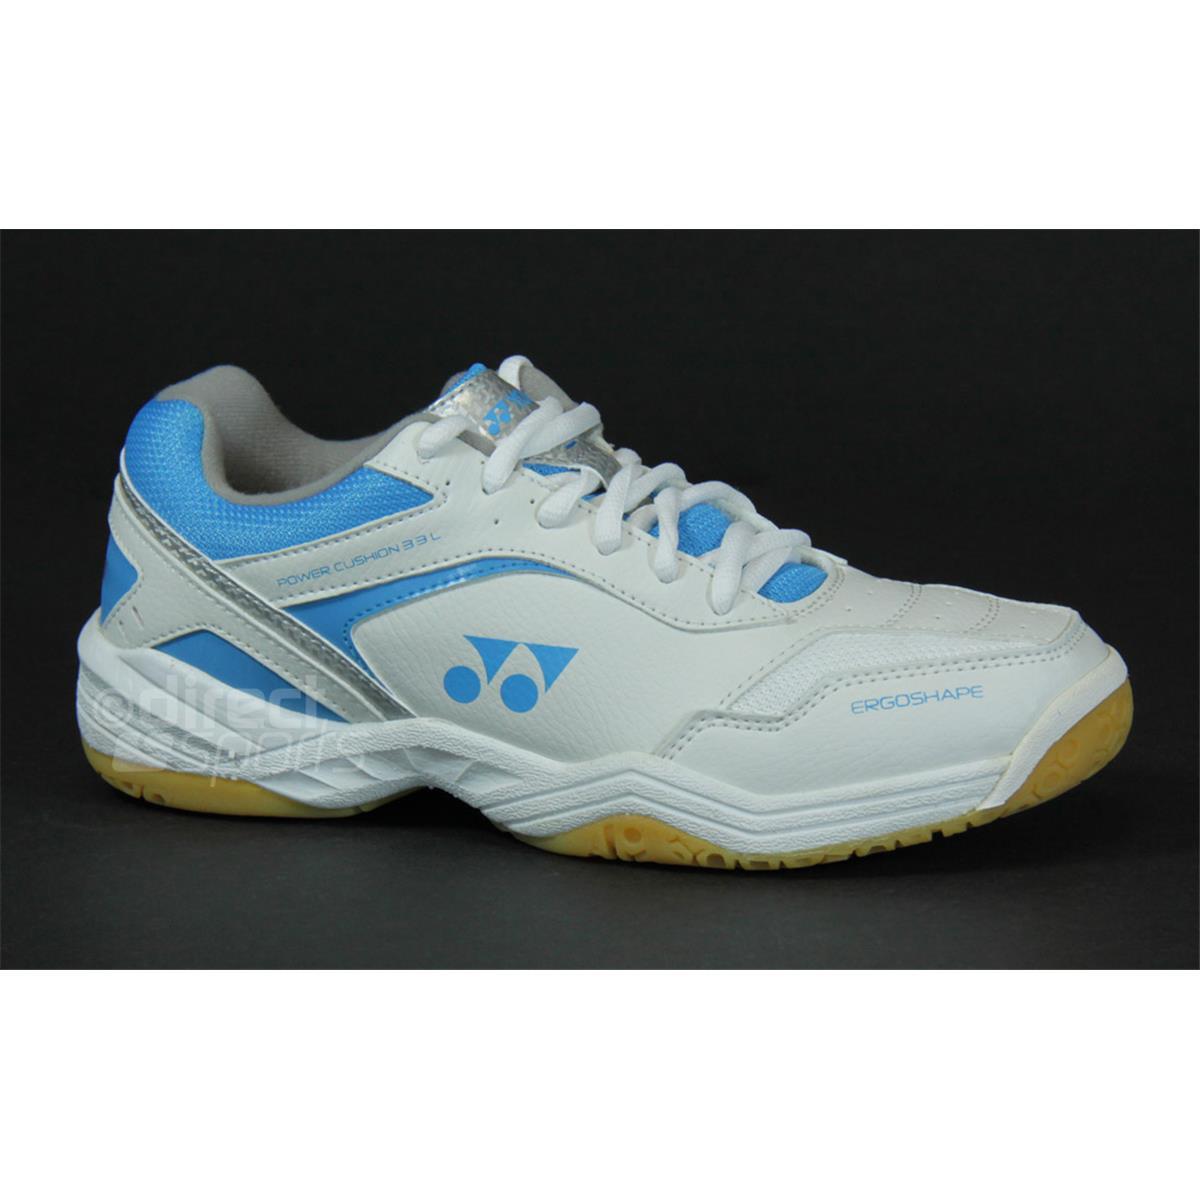 Creative  Power Cushion SHBF1 LX SHBF1LX 2012 Aqua Blue Women Badminton Shoes